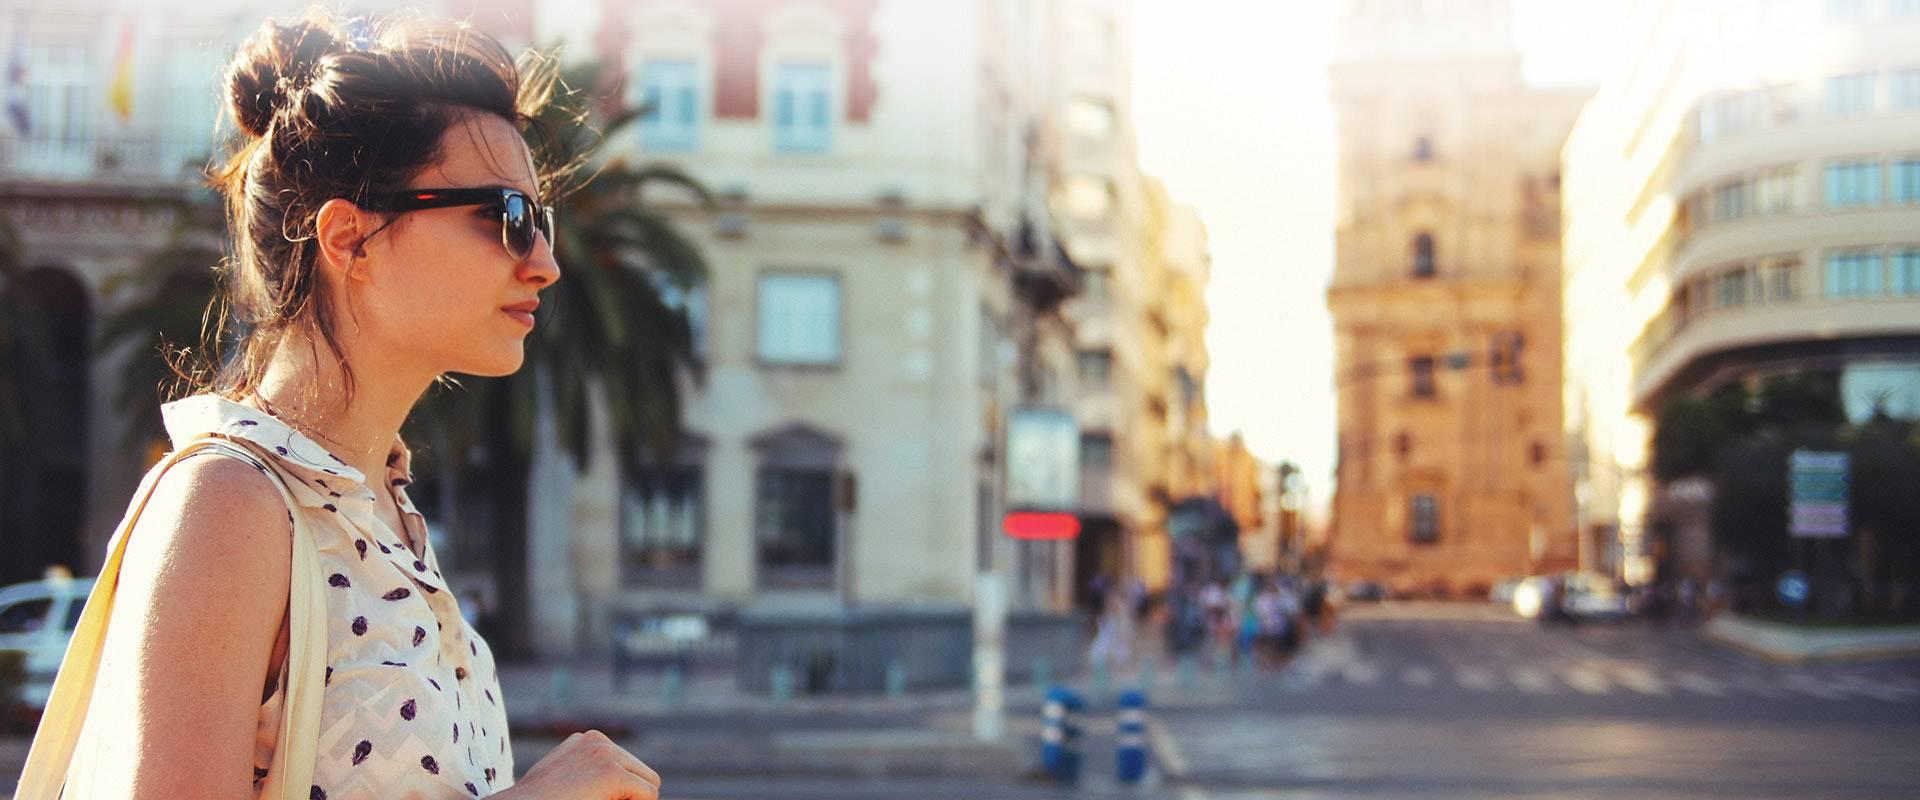 kundeservicejob i malaga